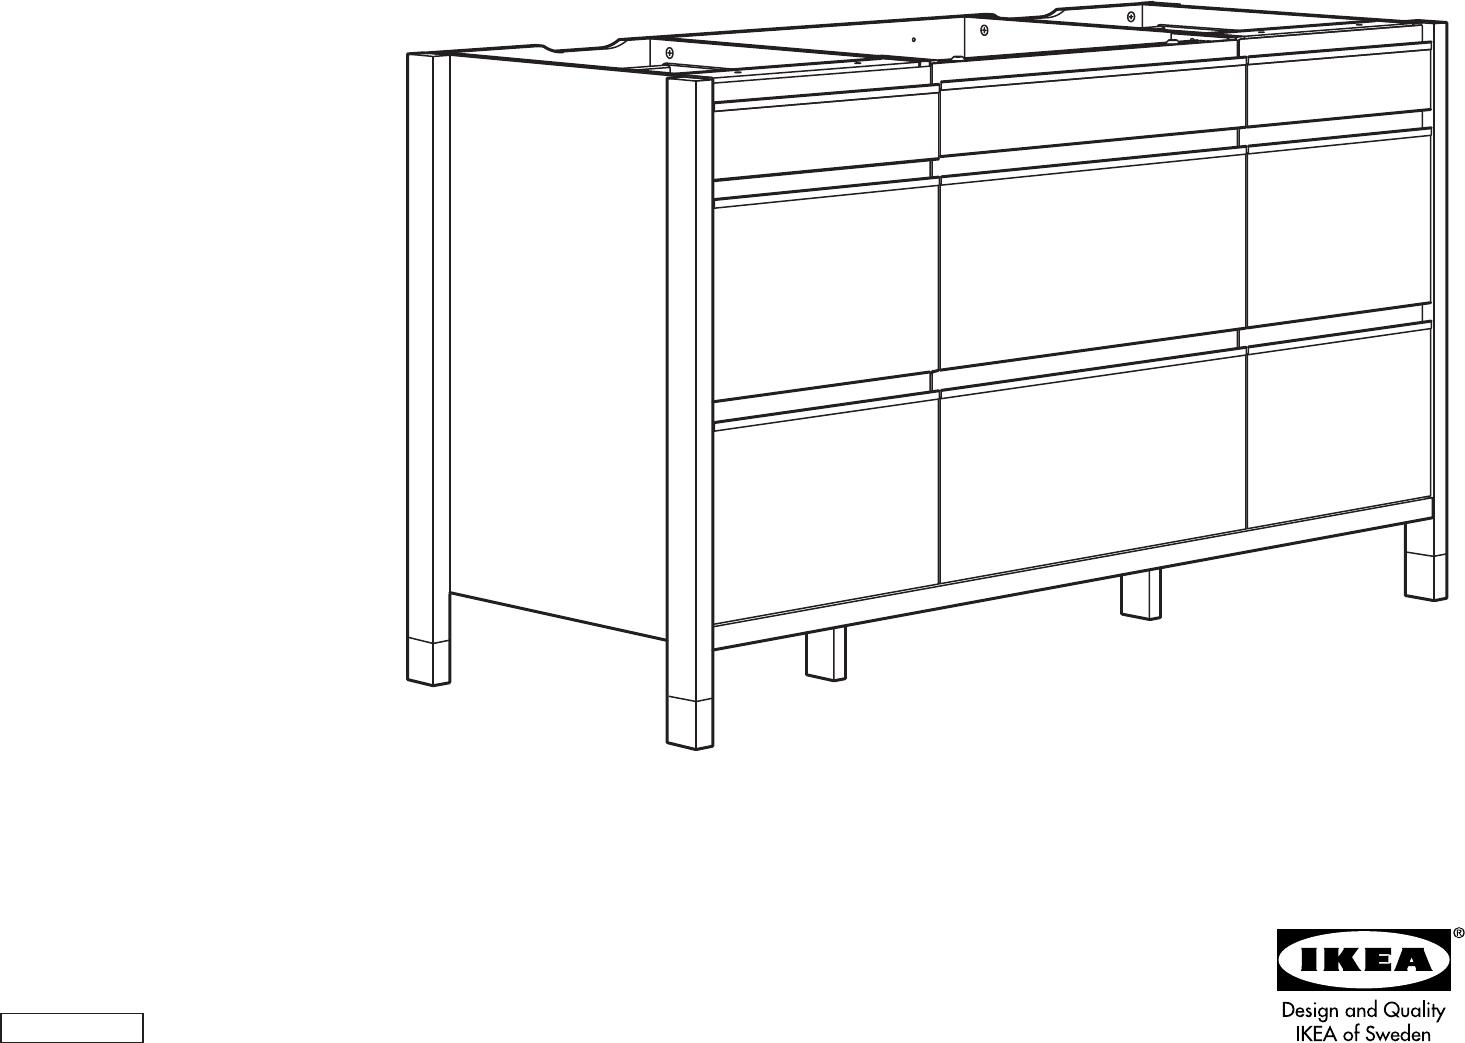 Ikea bravad kuche - Modul kuchenmobel ...